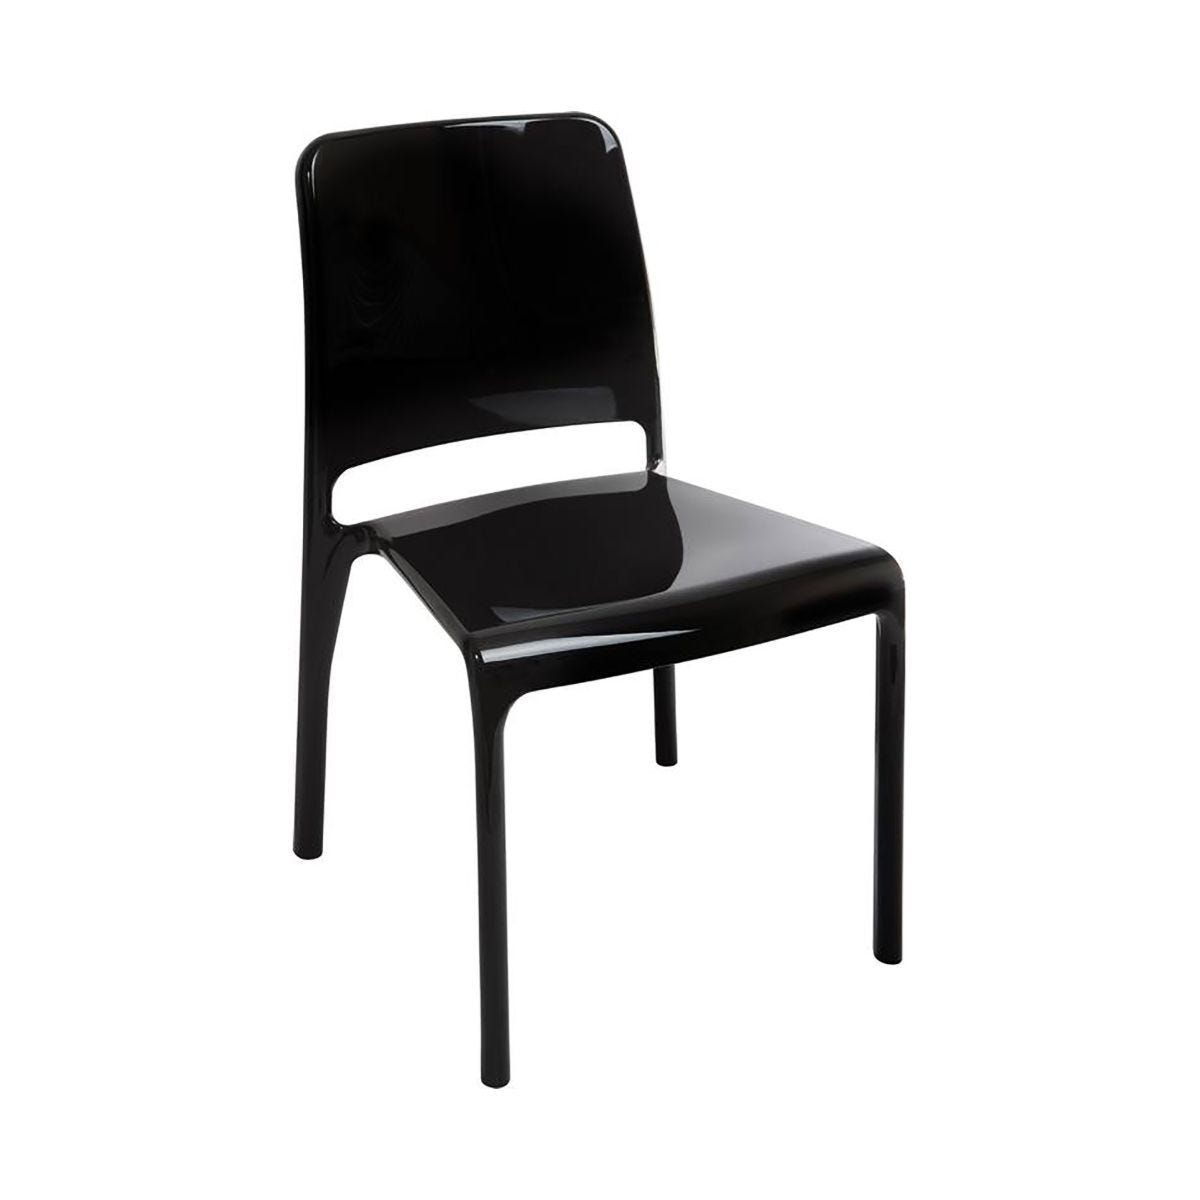 Teknik Office Clarity Breakout Chair Pack of 4 Black